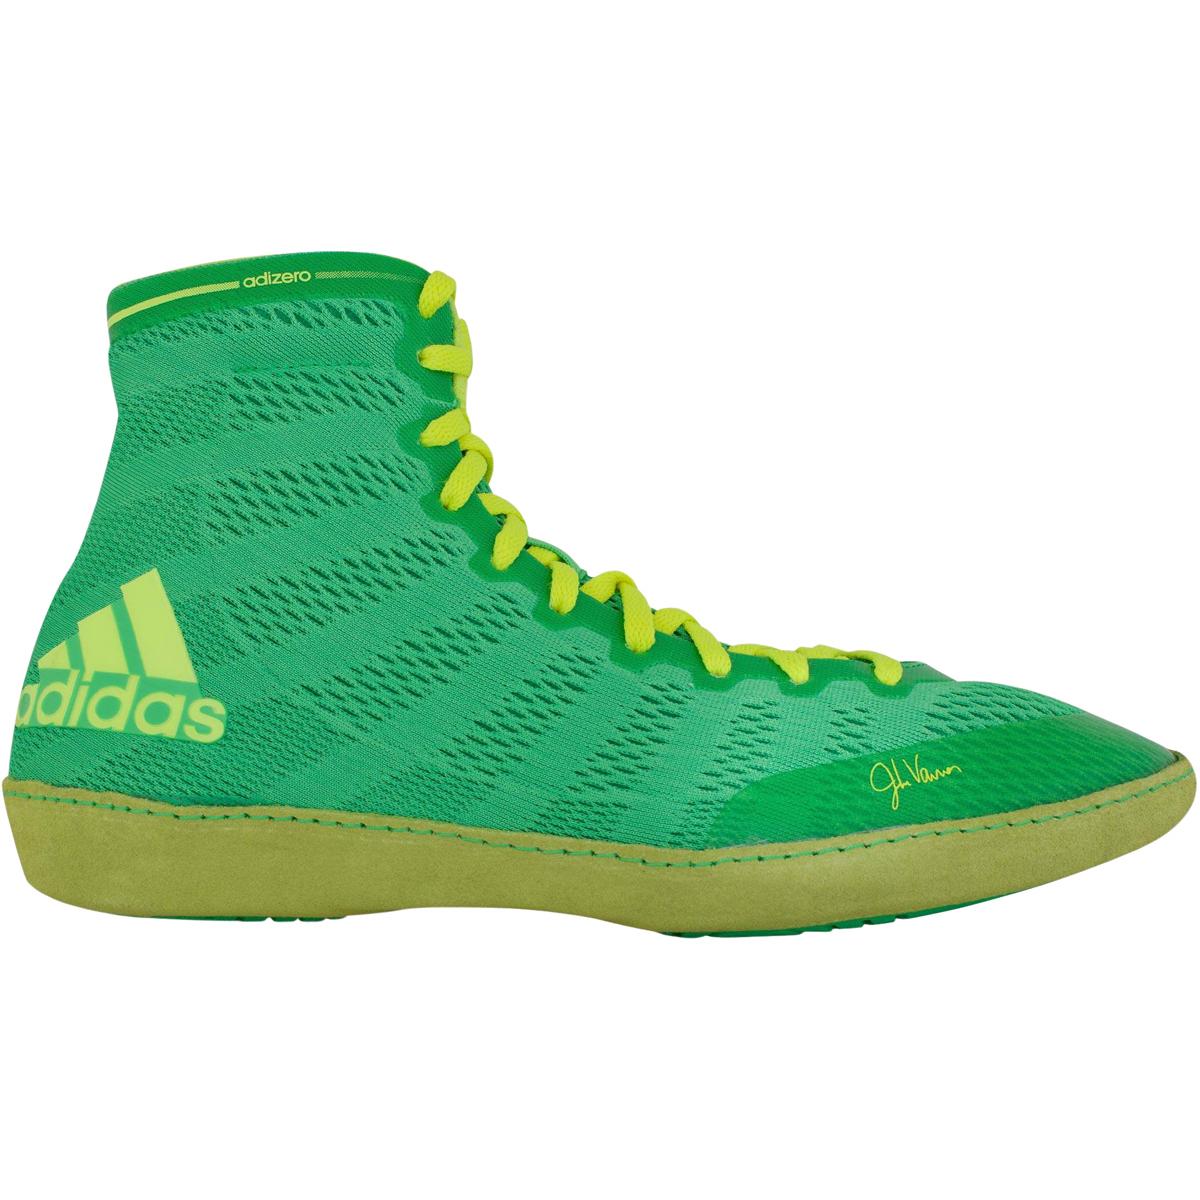 Adidas adizero Varner manzana High Top wrestling zapatos Flash manzana Varner / amarillo 29141f